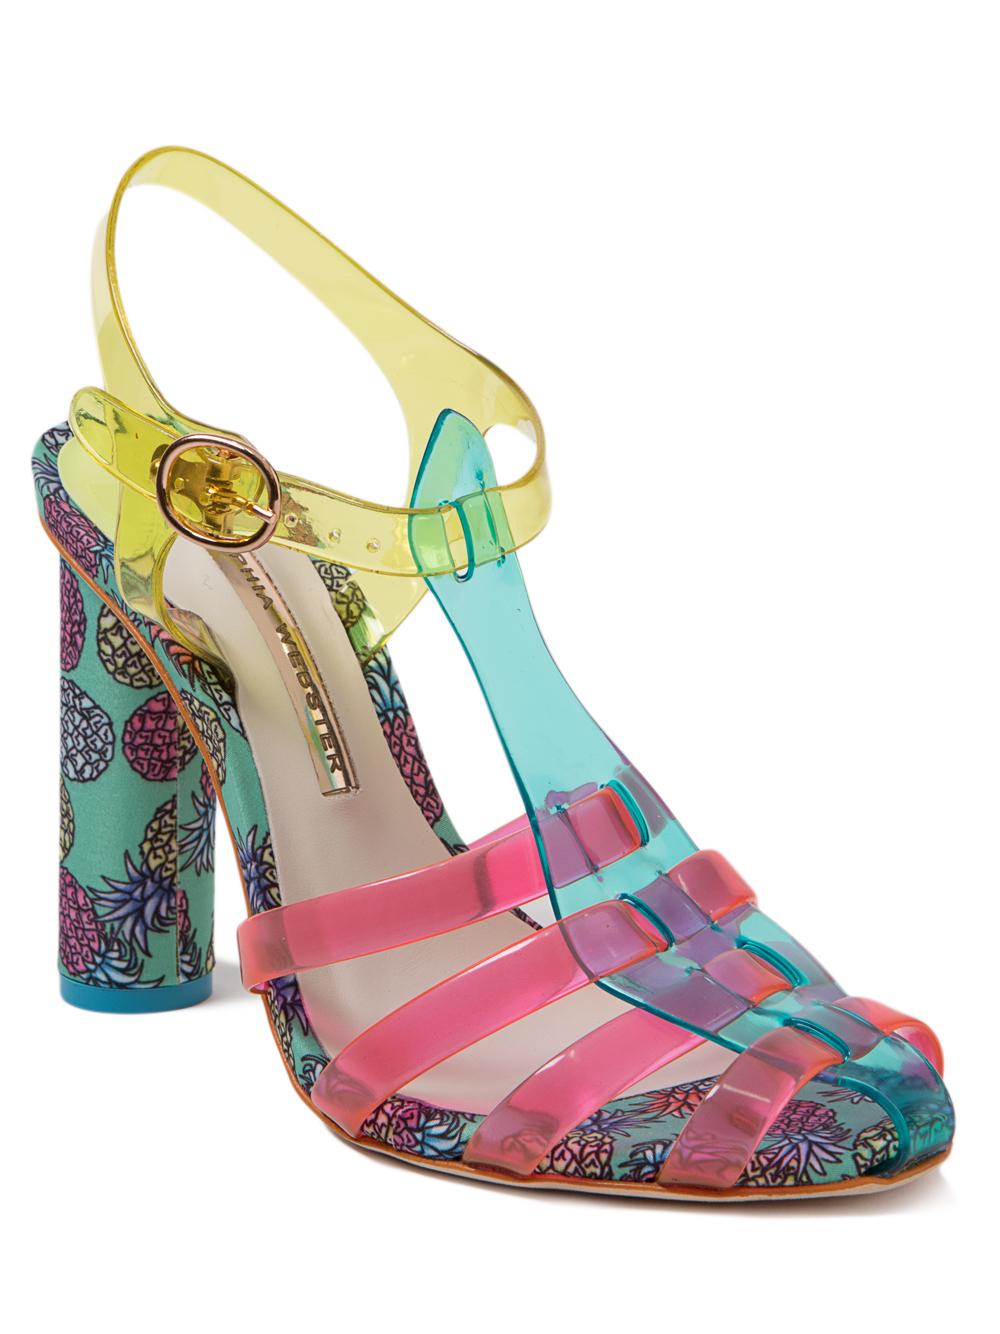 cda079a06c71 Sophia Webster Rosa Pineapple Heeled Sandals - Lyst